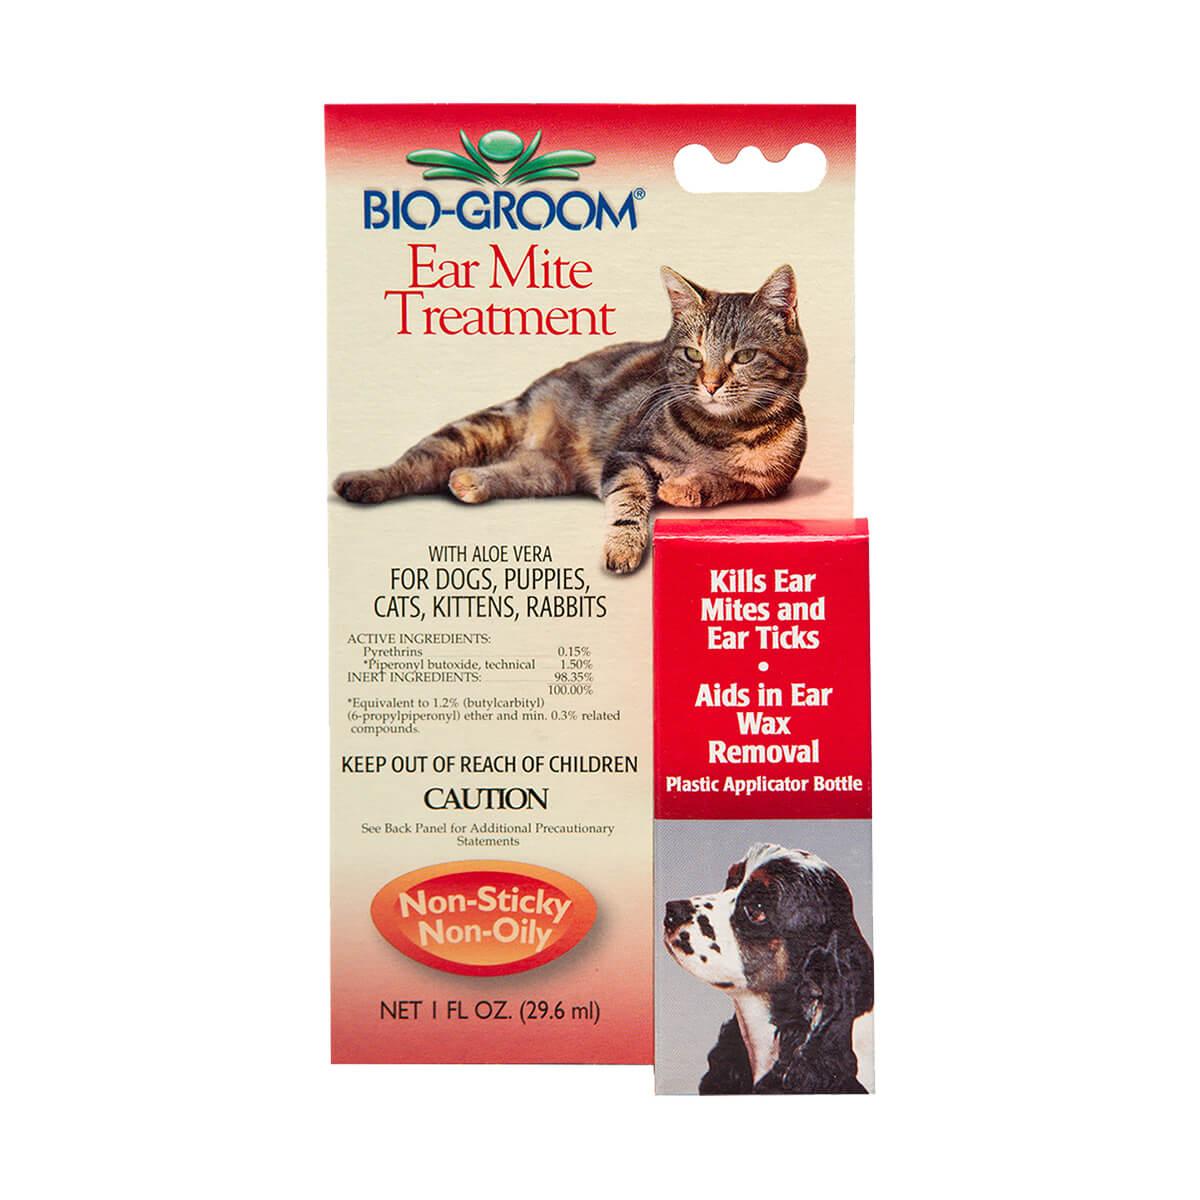 Bio-groom Ear Mite Treatment for Dog and Cat DD7368 - 29ml